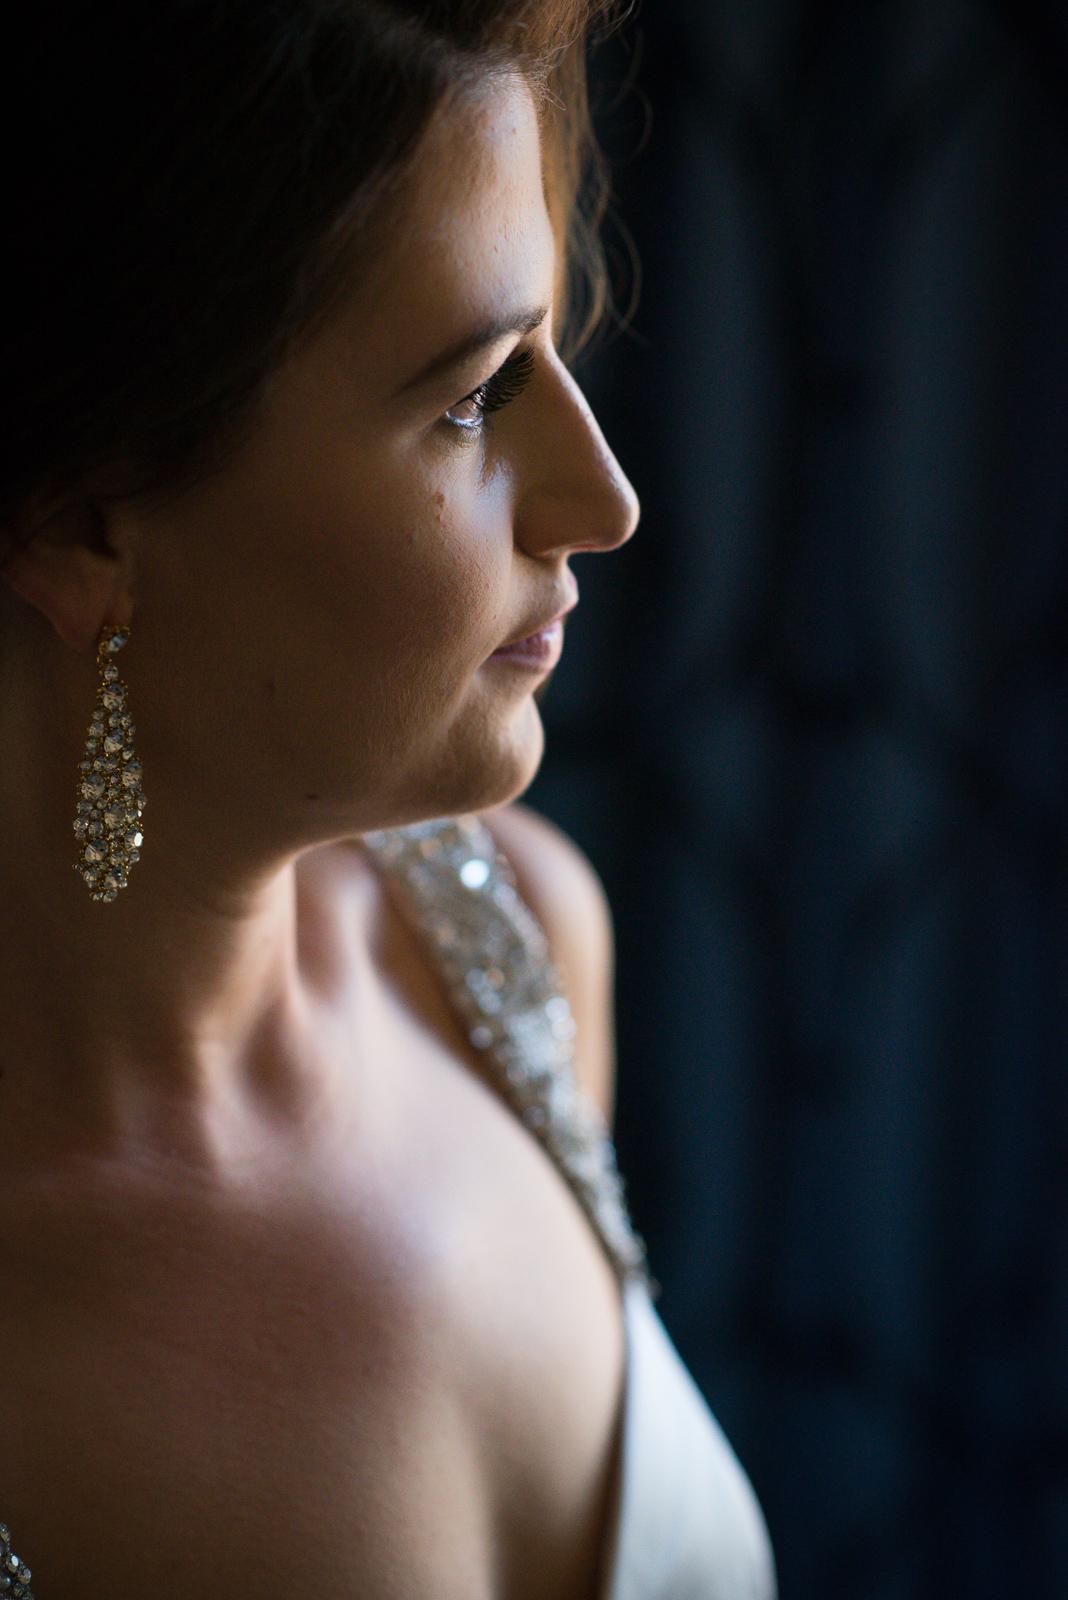 scranton-hilton-wedding-photographer-steven-serge-northeast-pa--13.jpg